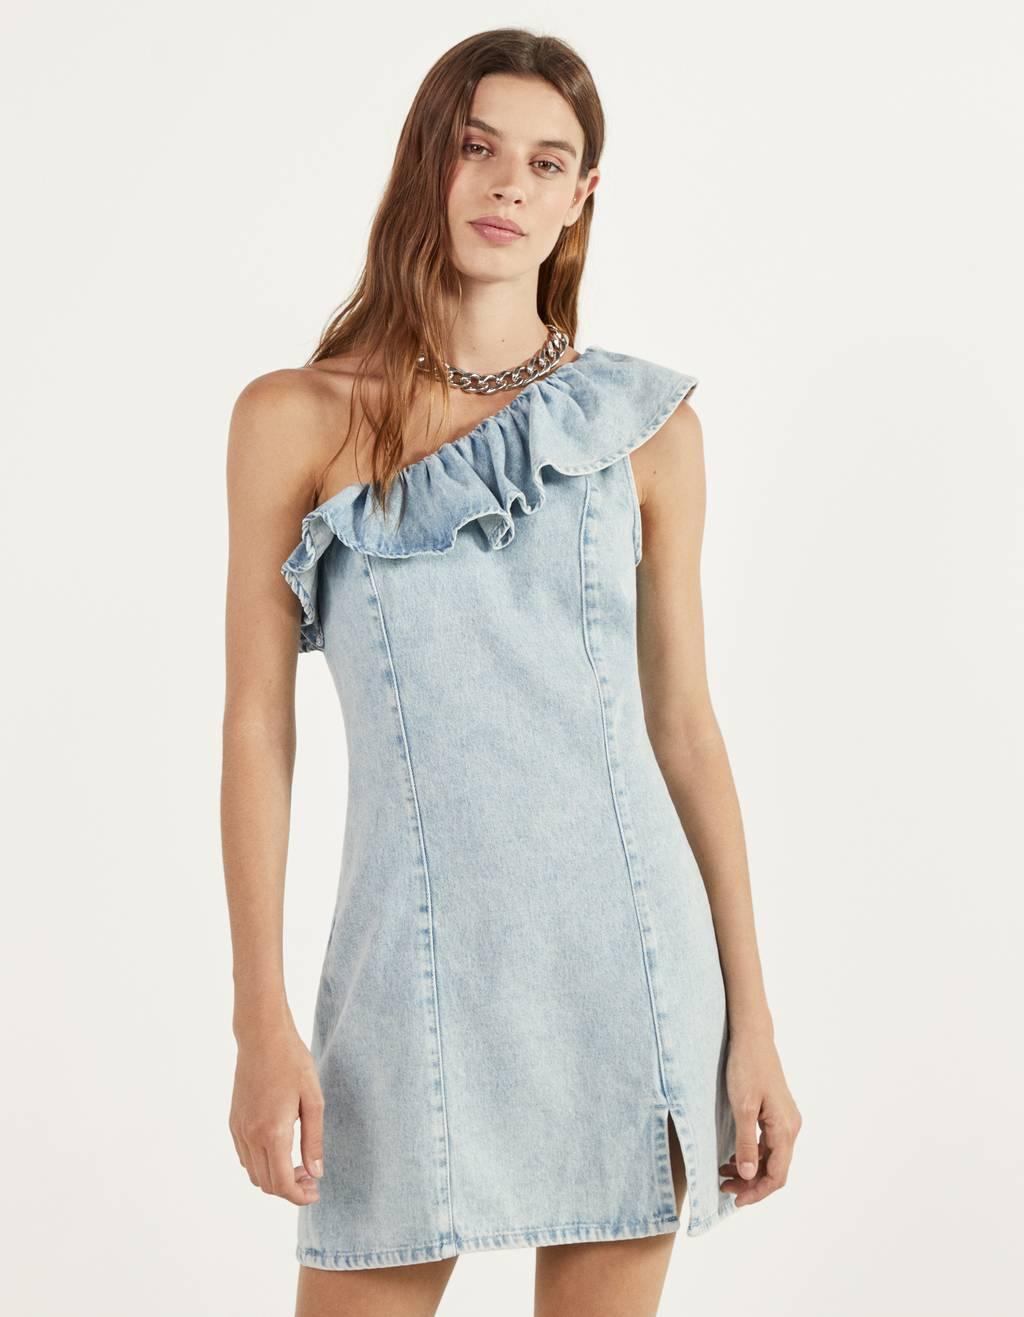 Asymmetric dress with ruffle trims